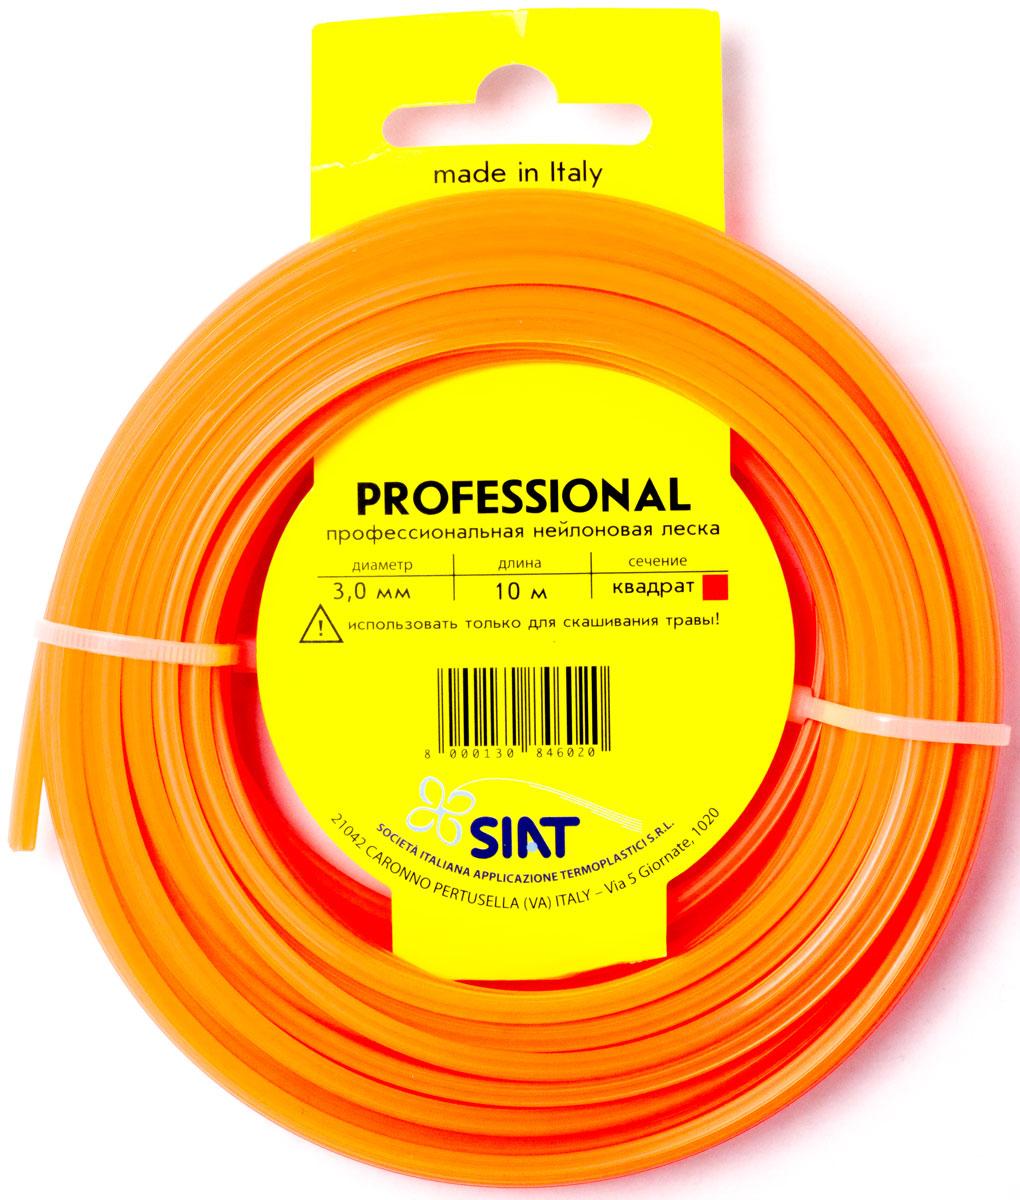 Леска для триммера Siat Professional Siat. Квадрат, диаметр 3 мм, длина 10 м леска для триммера siat professional siat квадрат цвет красный диаметр 2 мм длина 15 м